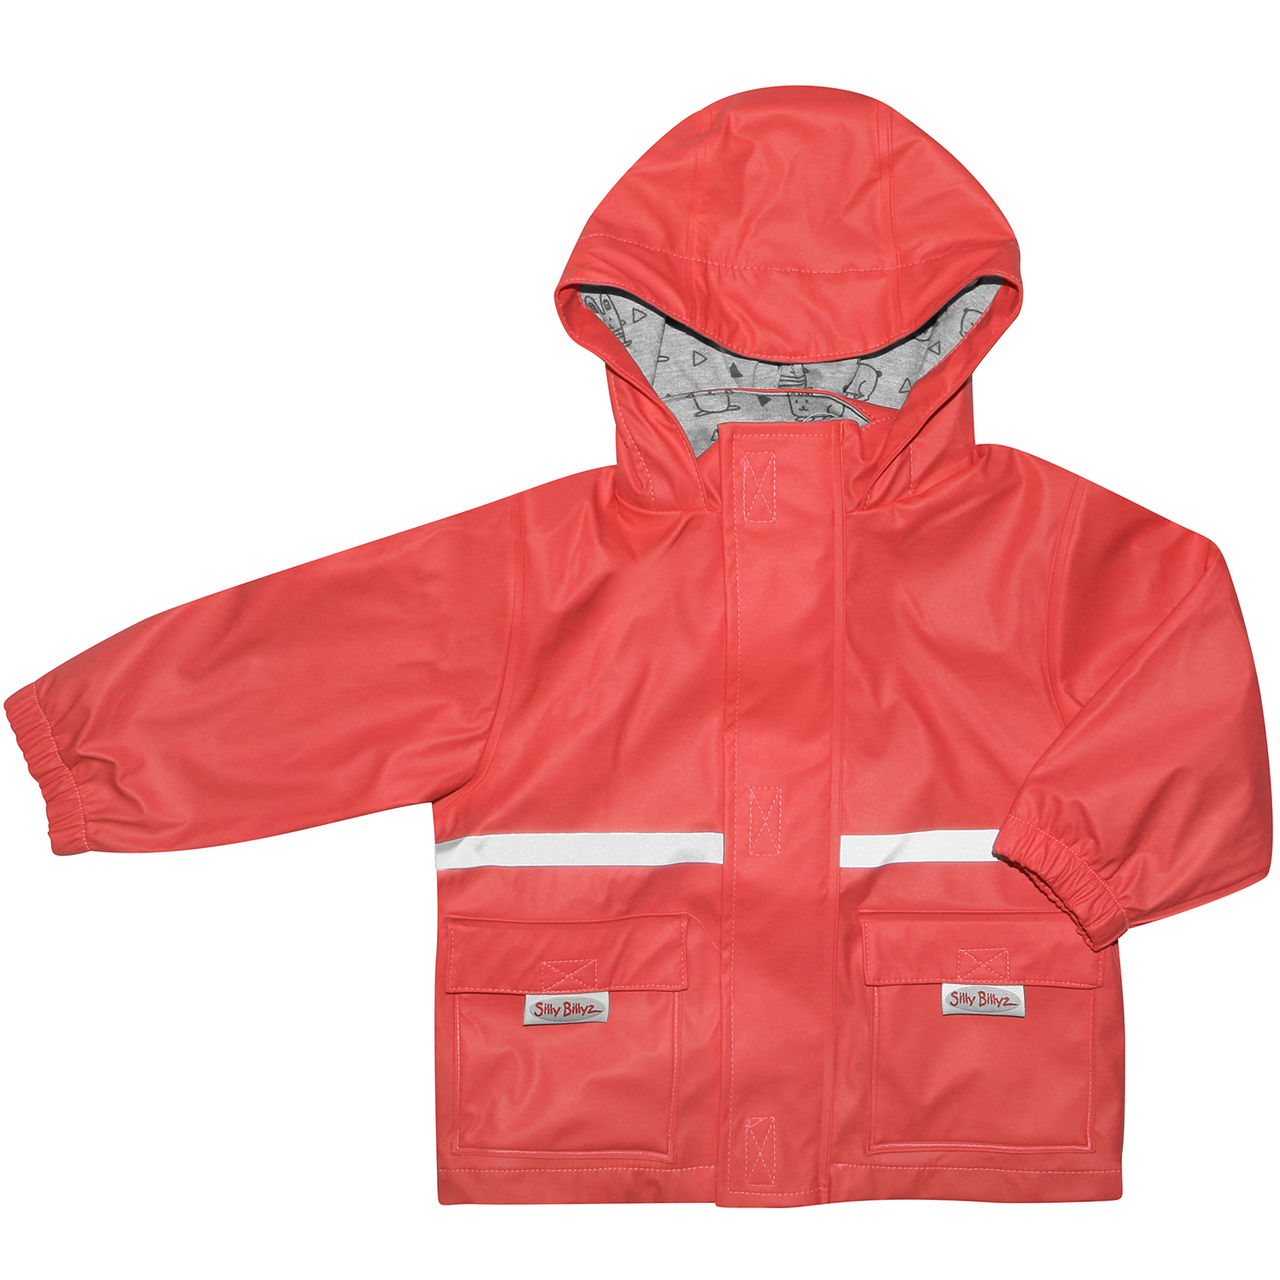 Silly Billyz Waterproof Jacket - Red (1-2 Yrs) image